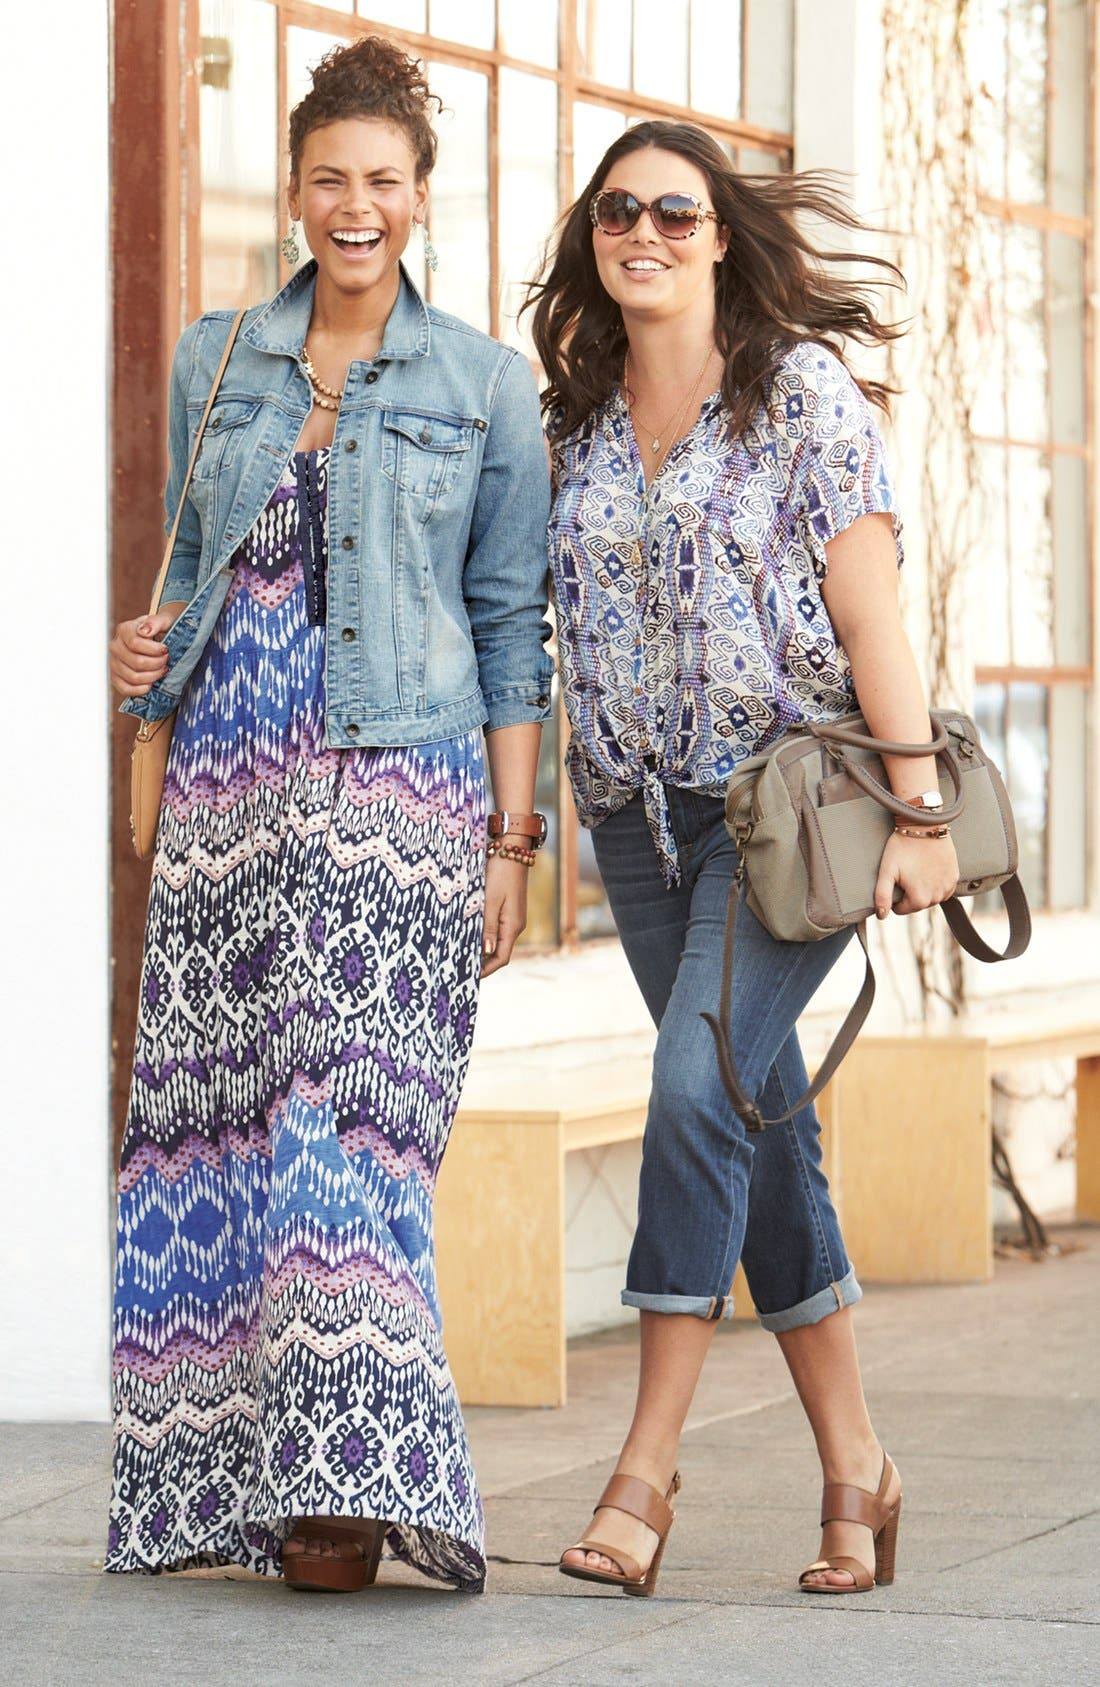 Alternate Image 1 Selected - Lucky Brand Denim Jacket & Maxi Dress